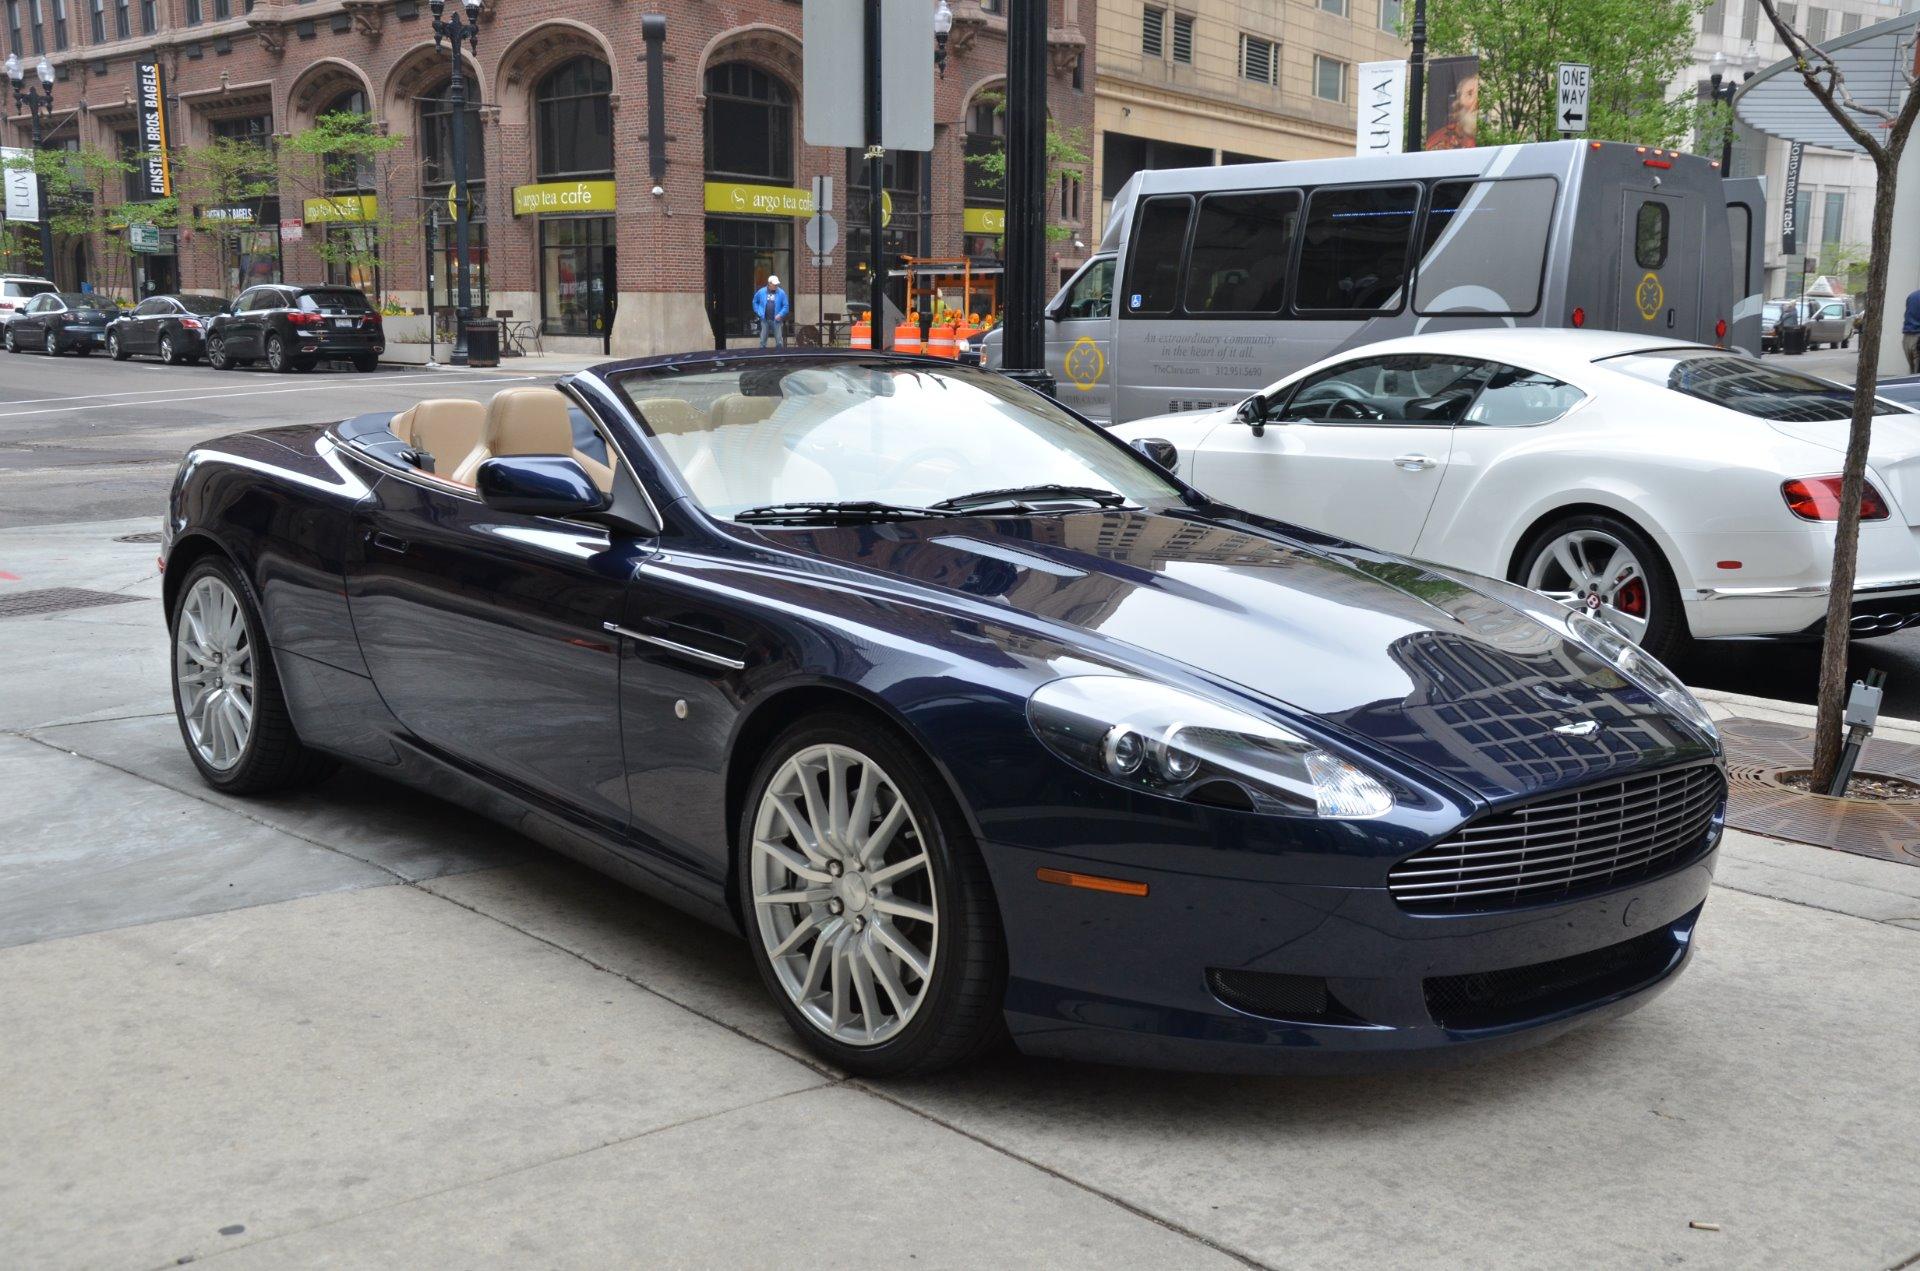 Aston Martin DB Volante Stock GC For Sale Near Chicago - 2006 aston martin db9 for sale